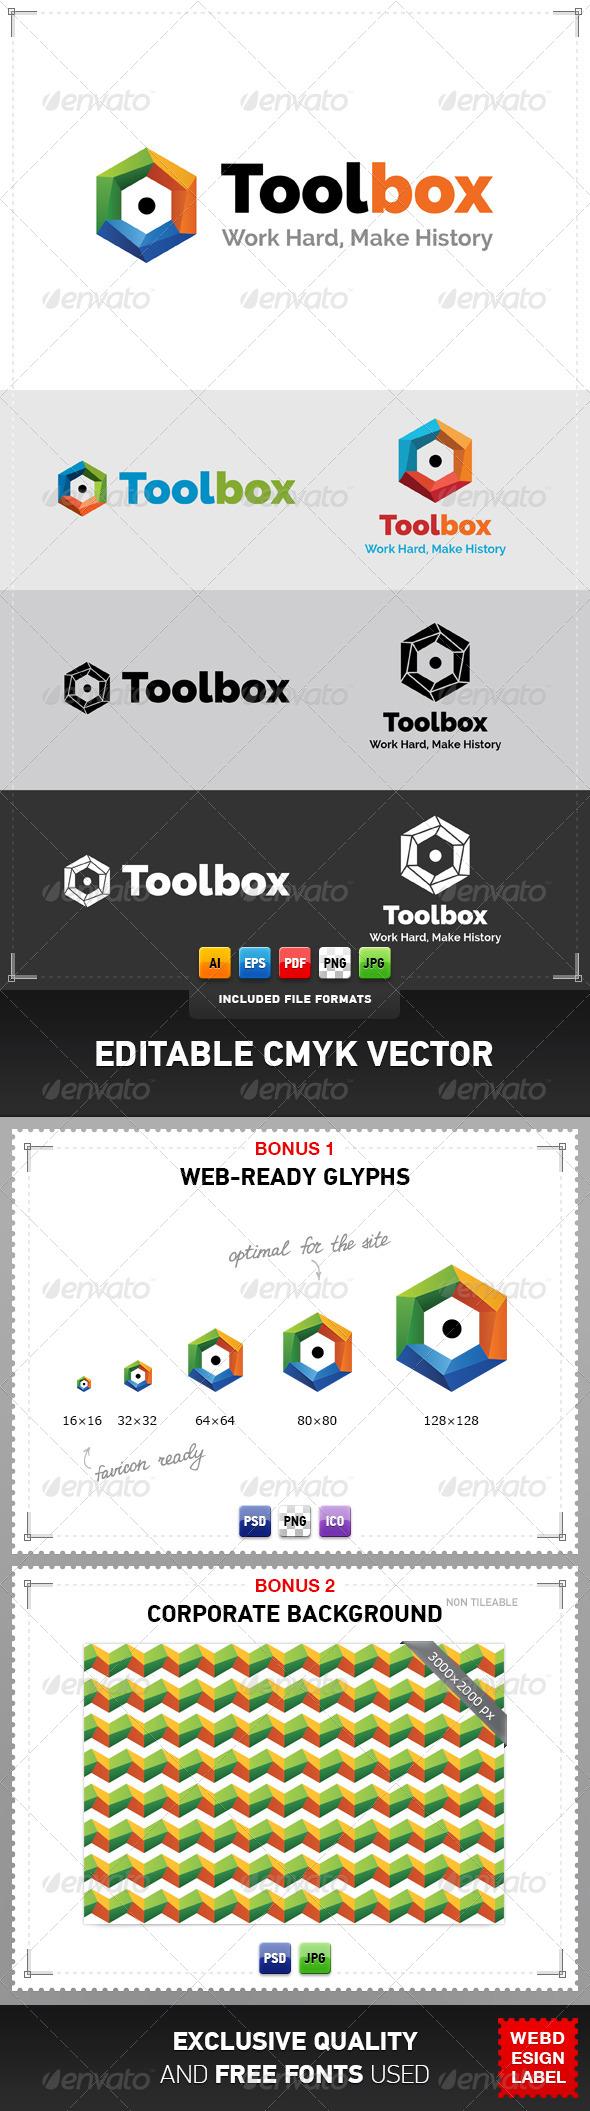 Toolbox Logo - Objects Logo Templates